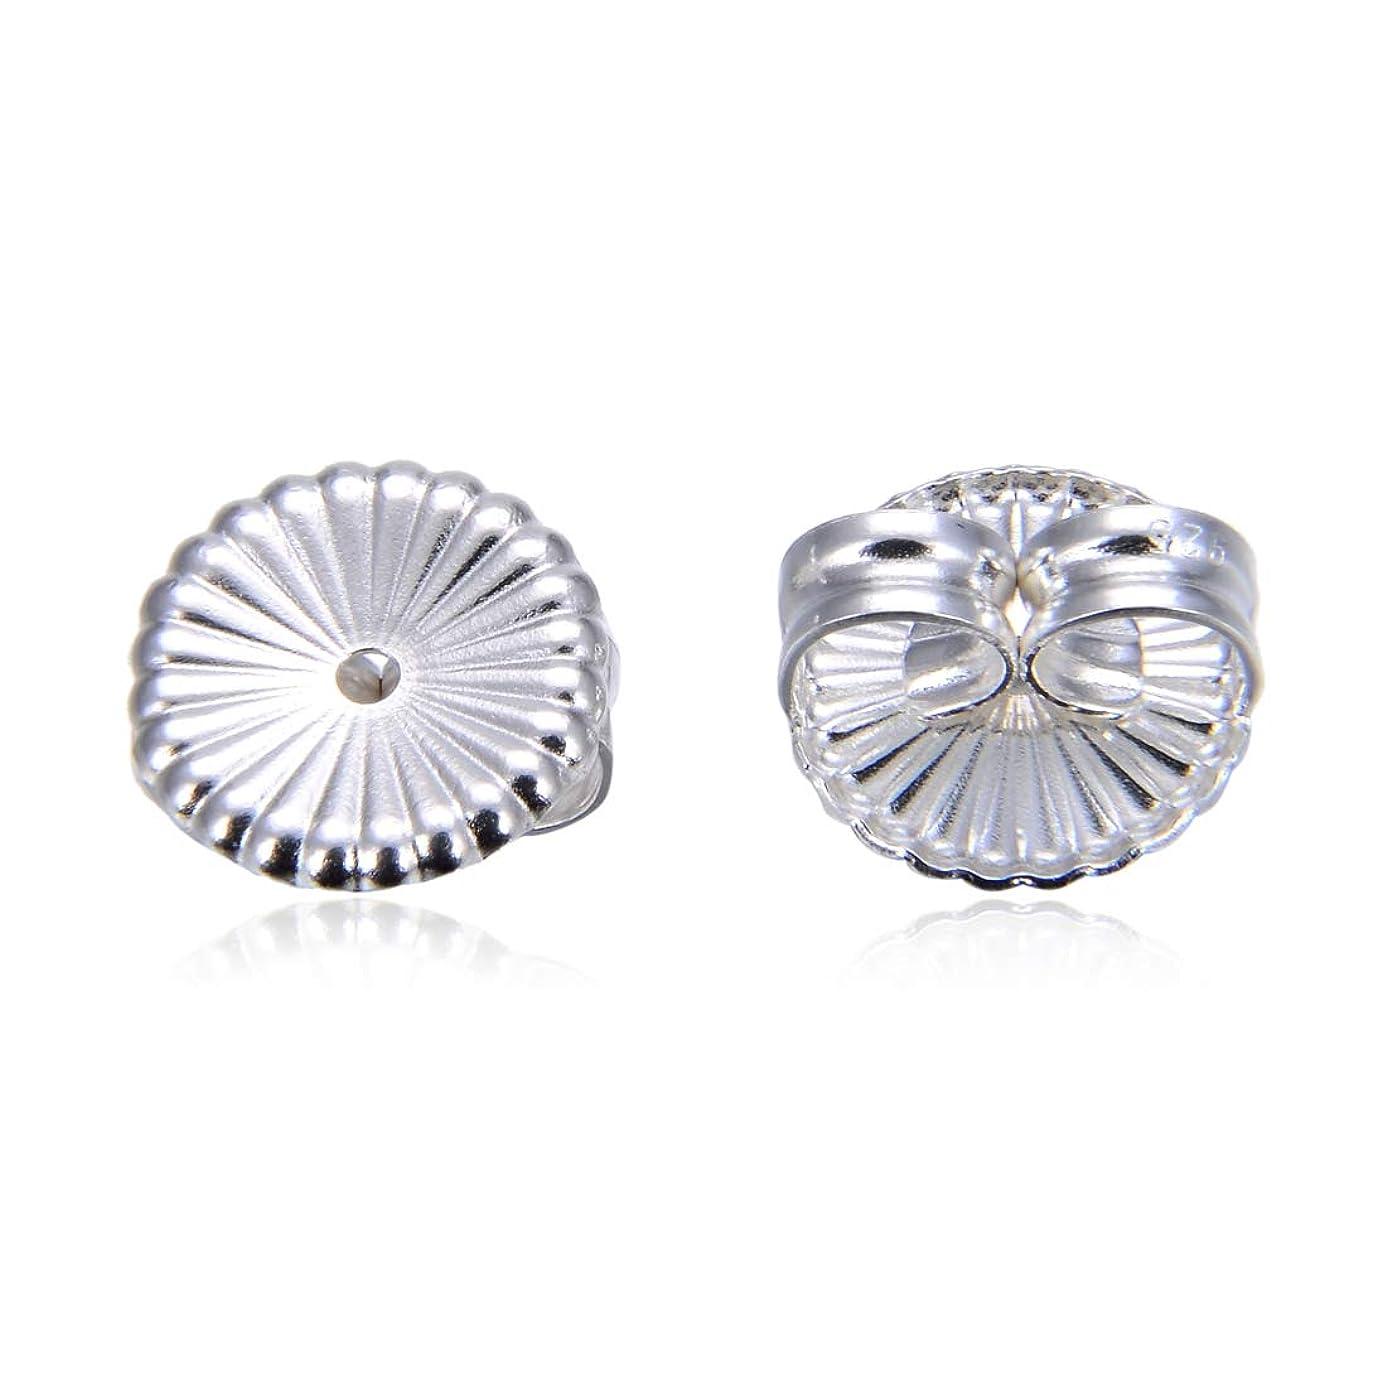 10pcs Authentic Sterling Silver 9mm Large Butterfly Earring Safety Backs Earnut Ear Nut Clutches for Stud Earrings SS331